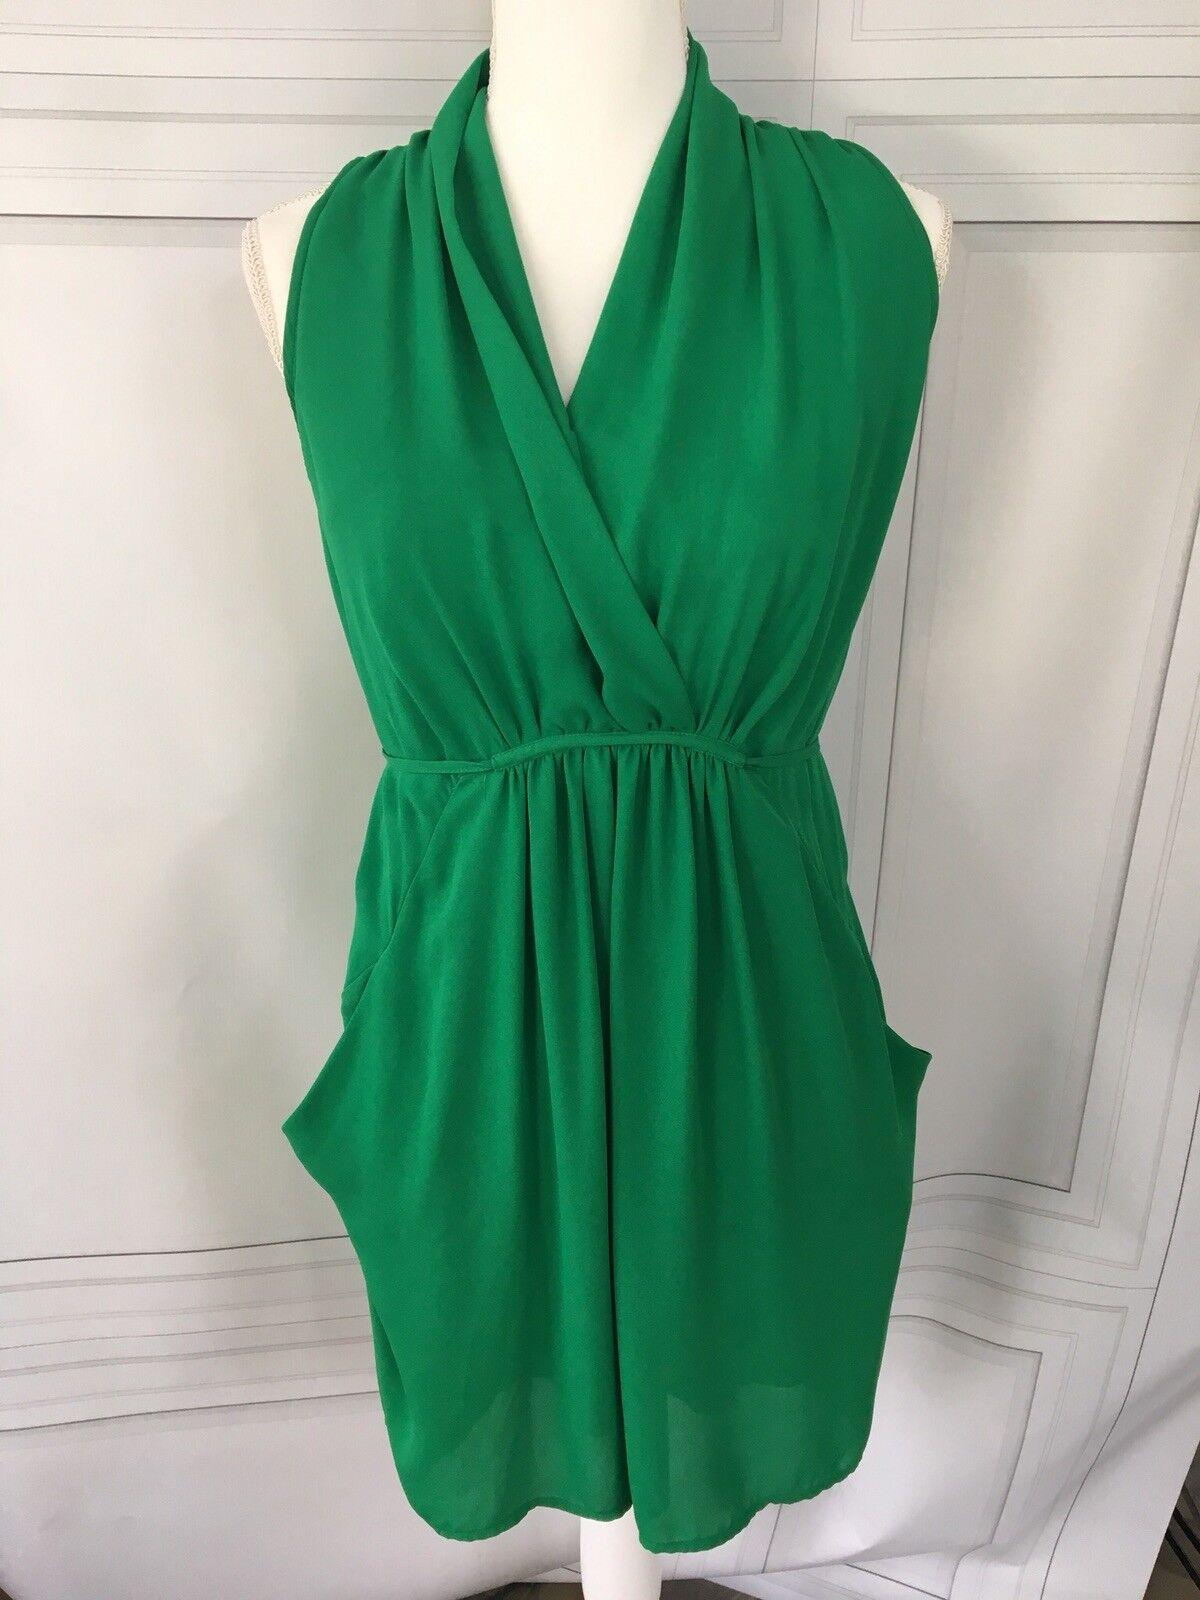 142d166e1ef98 Cusp Cusp Cusp for Neiman Marcus Kelly Green Silk Dress Sz S c0647f ...